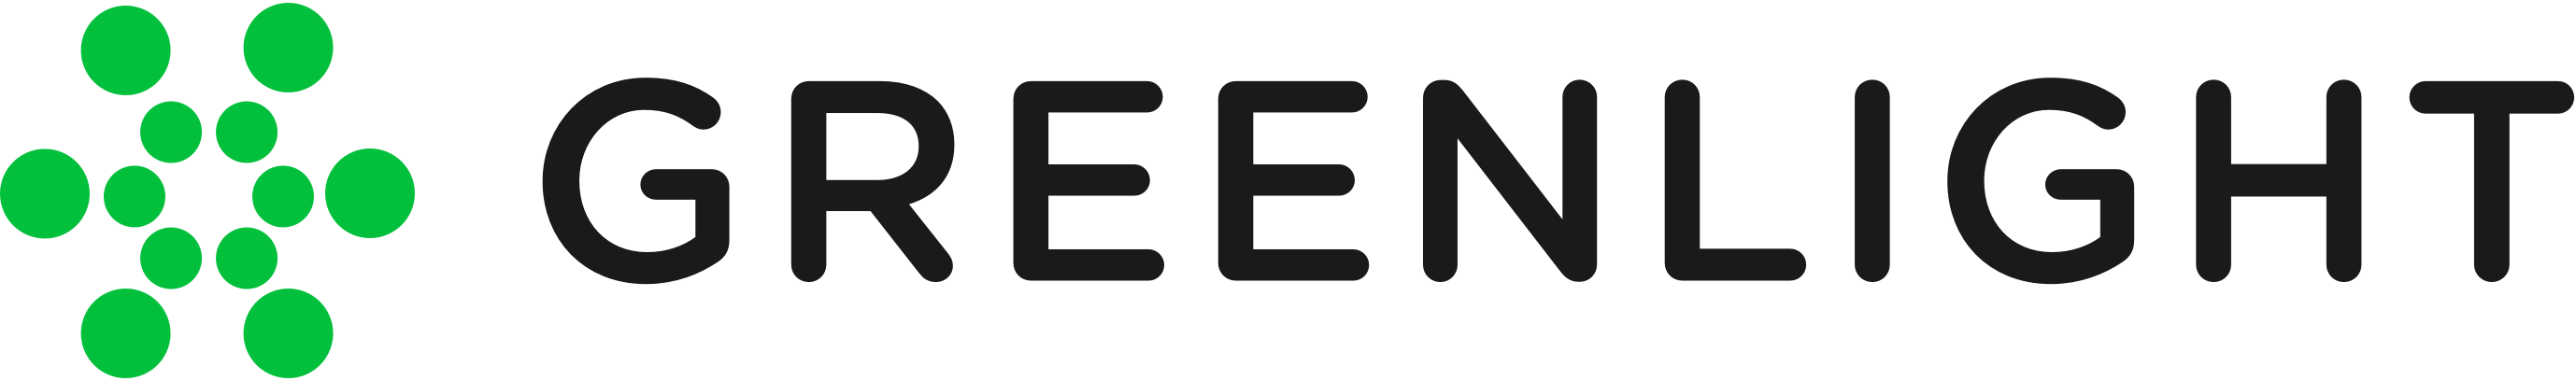 Greenlight Financial Technology Logo